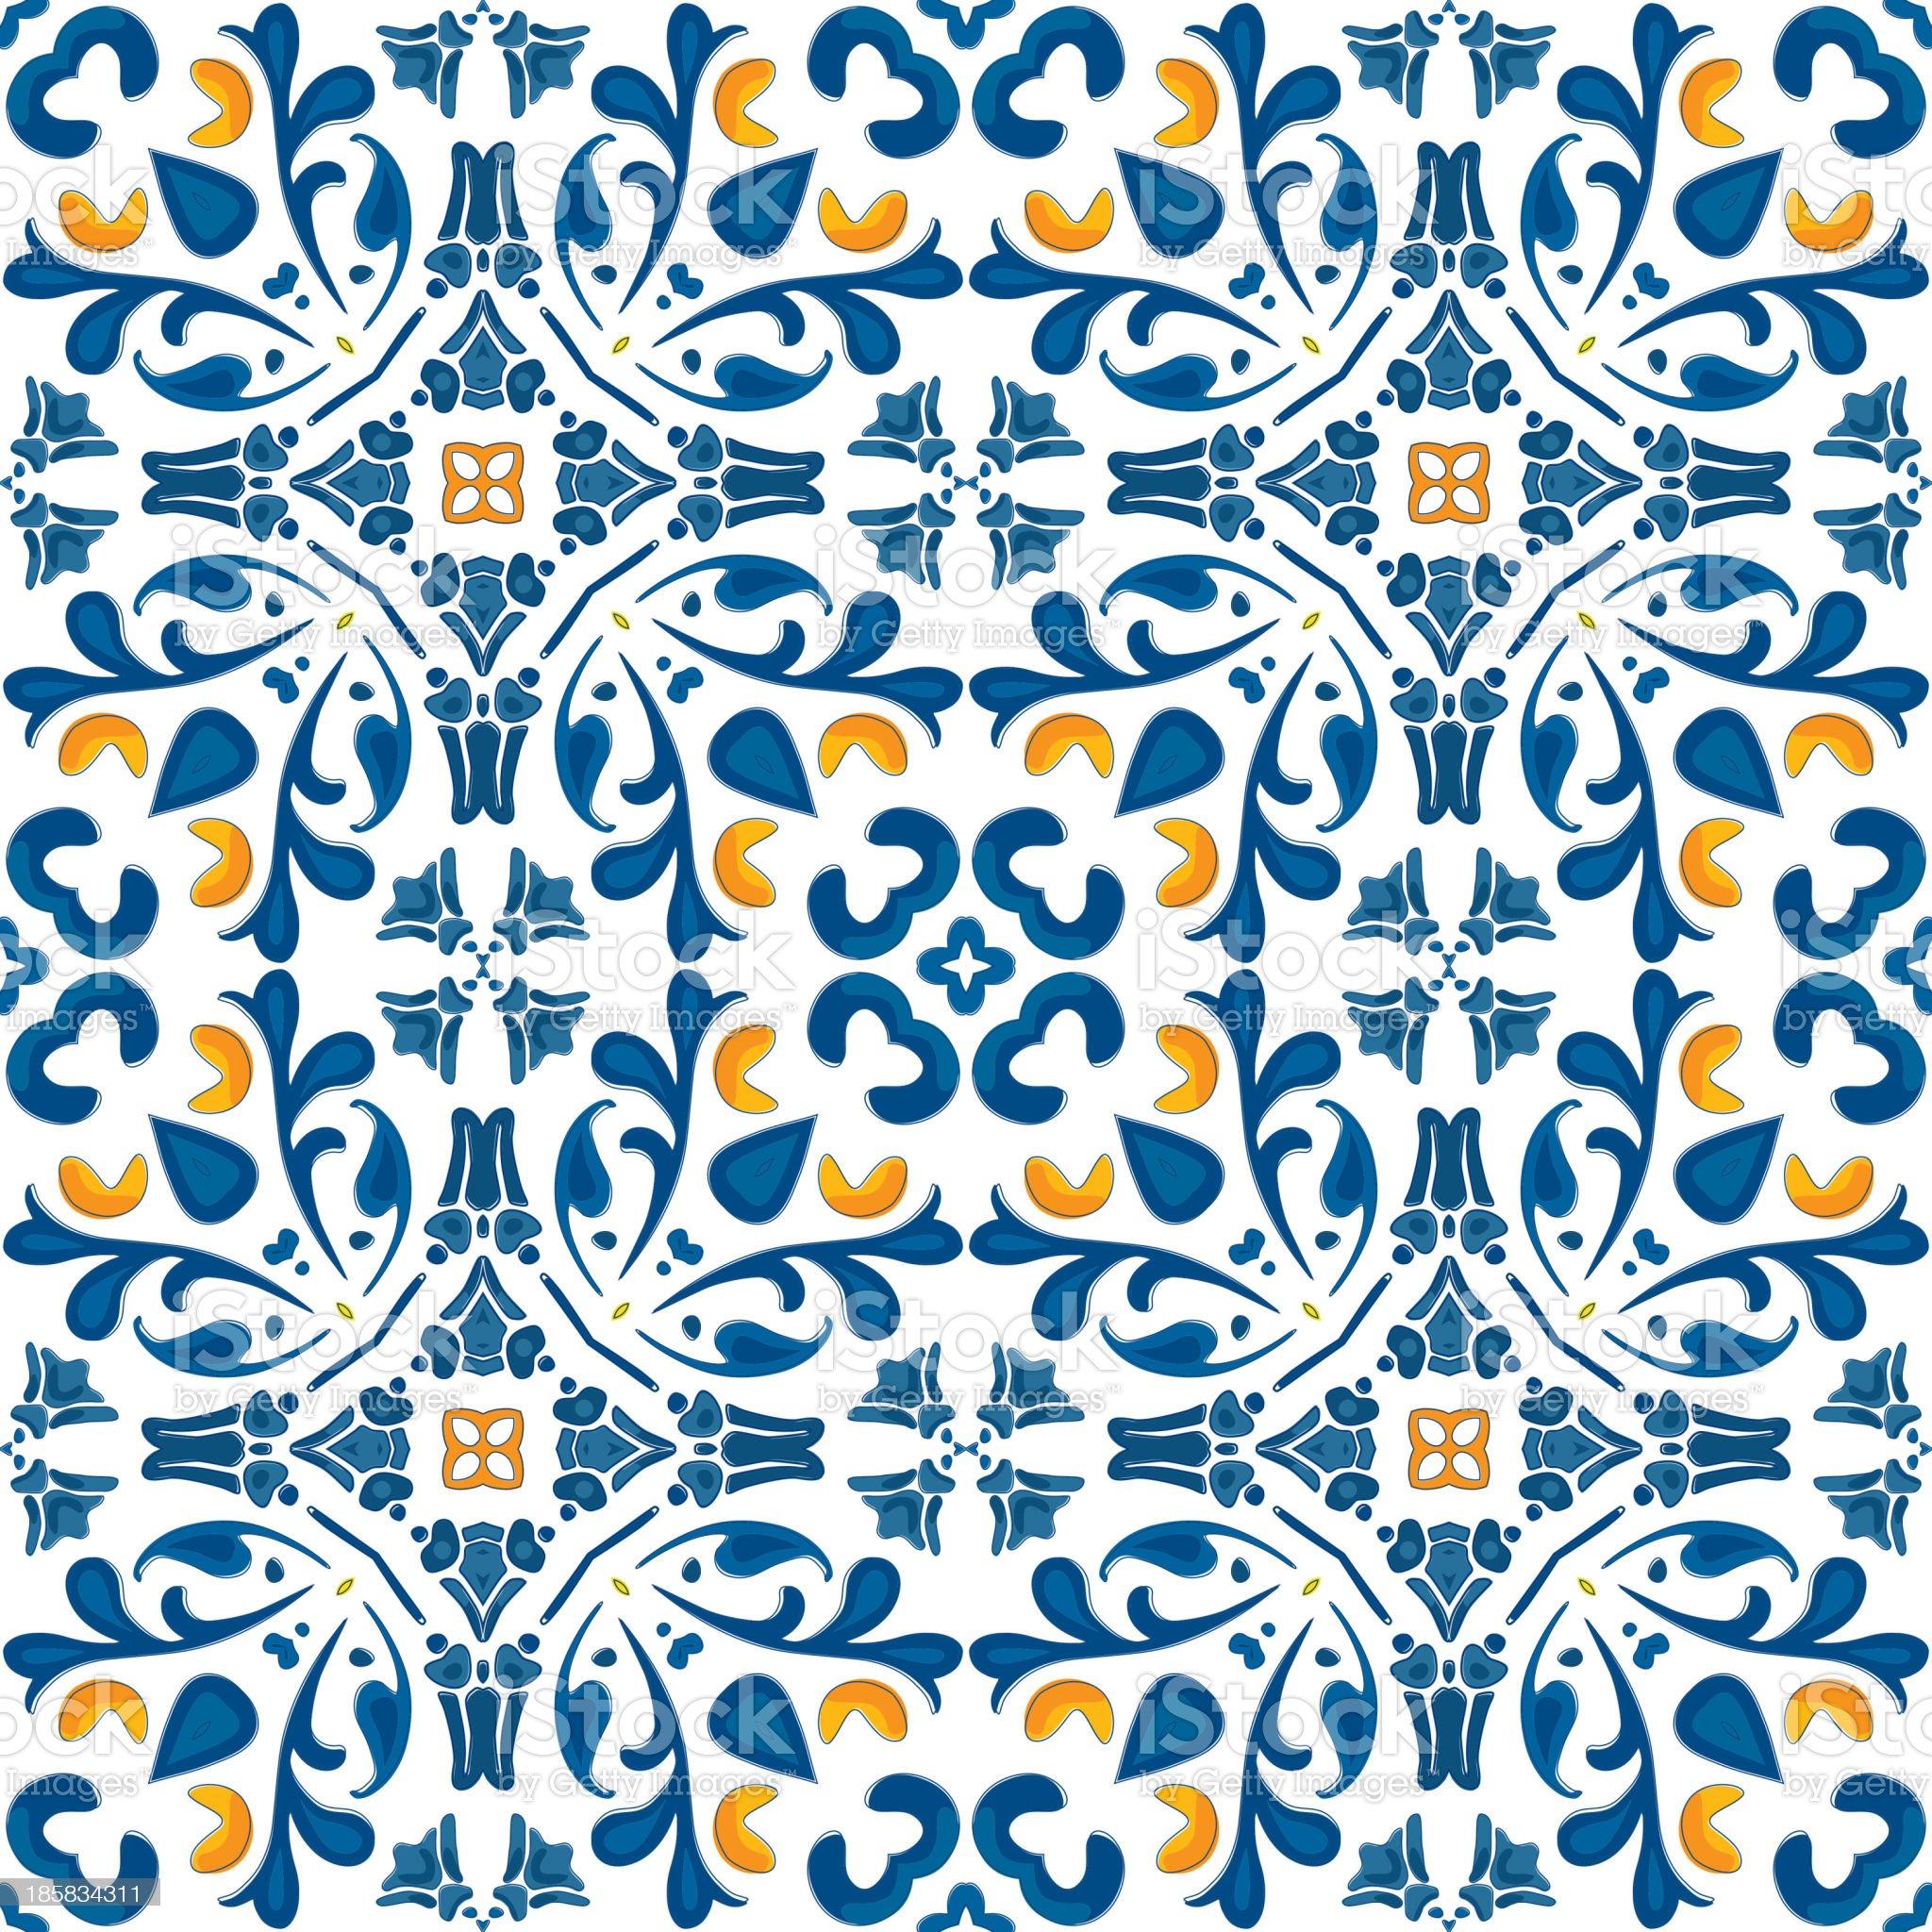 Orange and blue Portuguese tile design royalty-free stock vector art